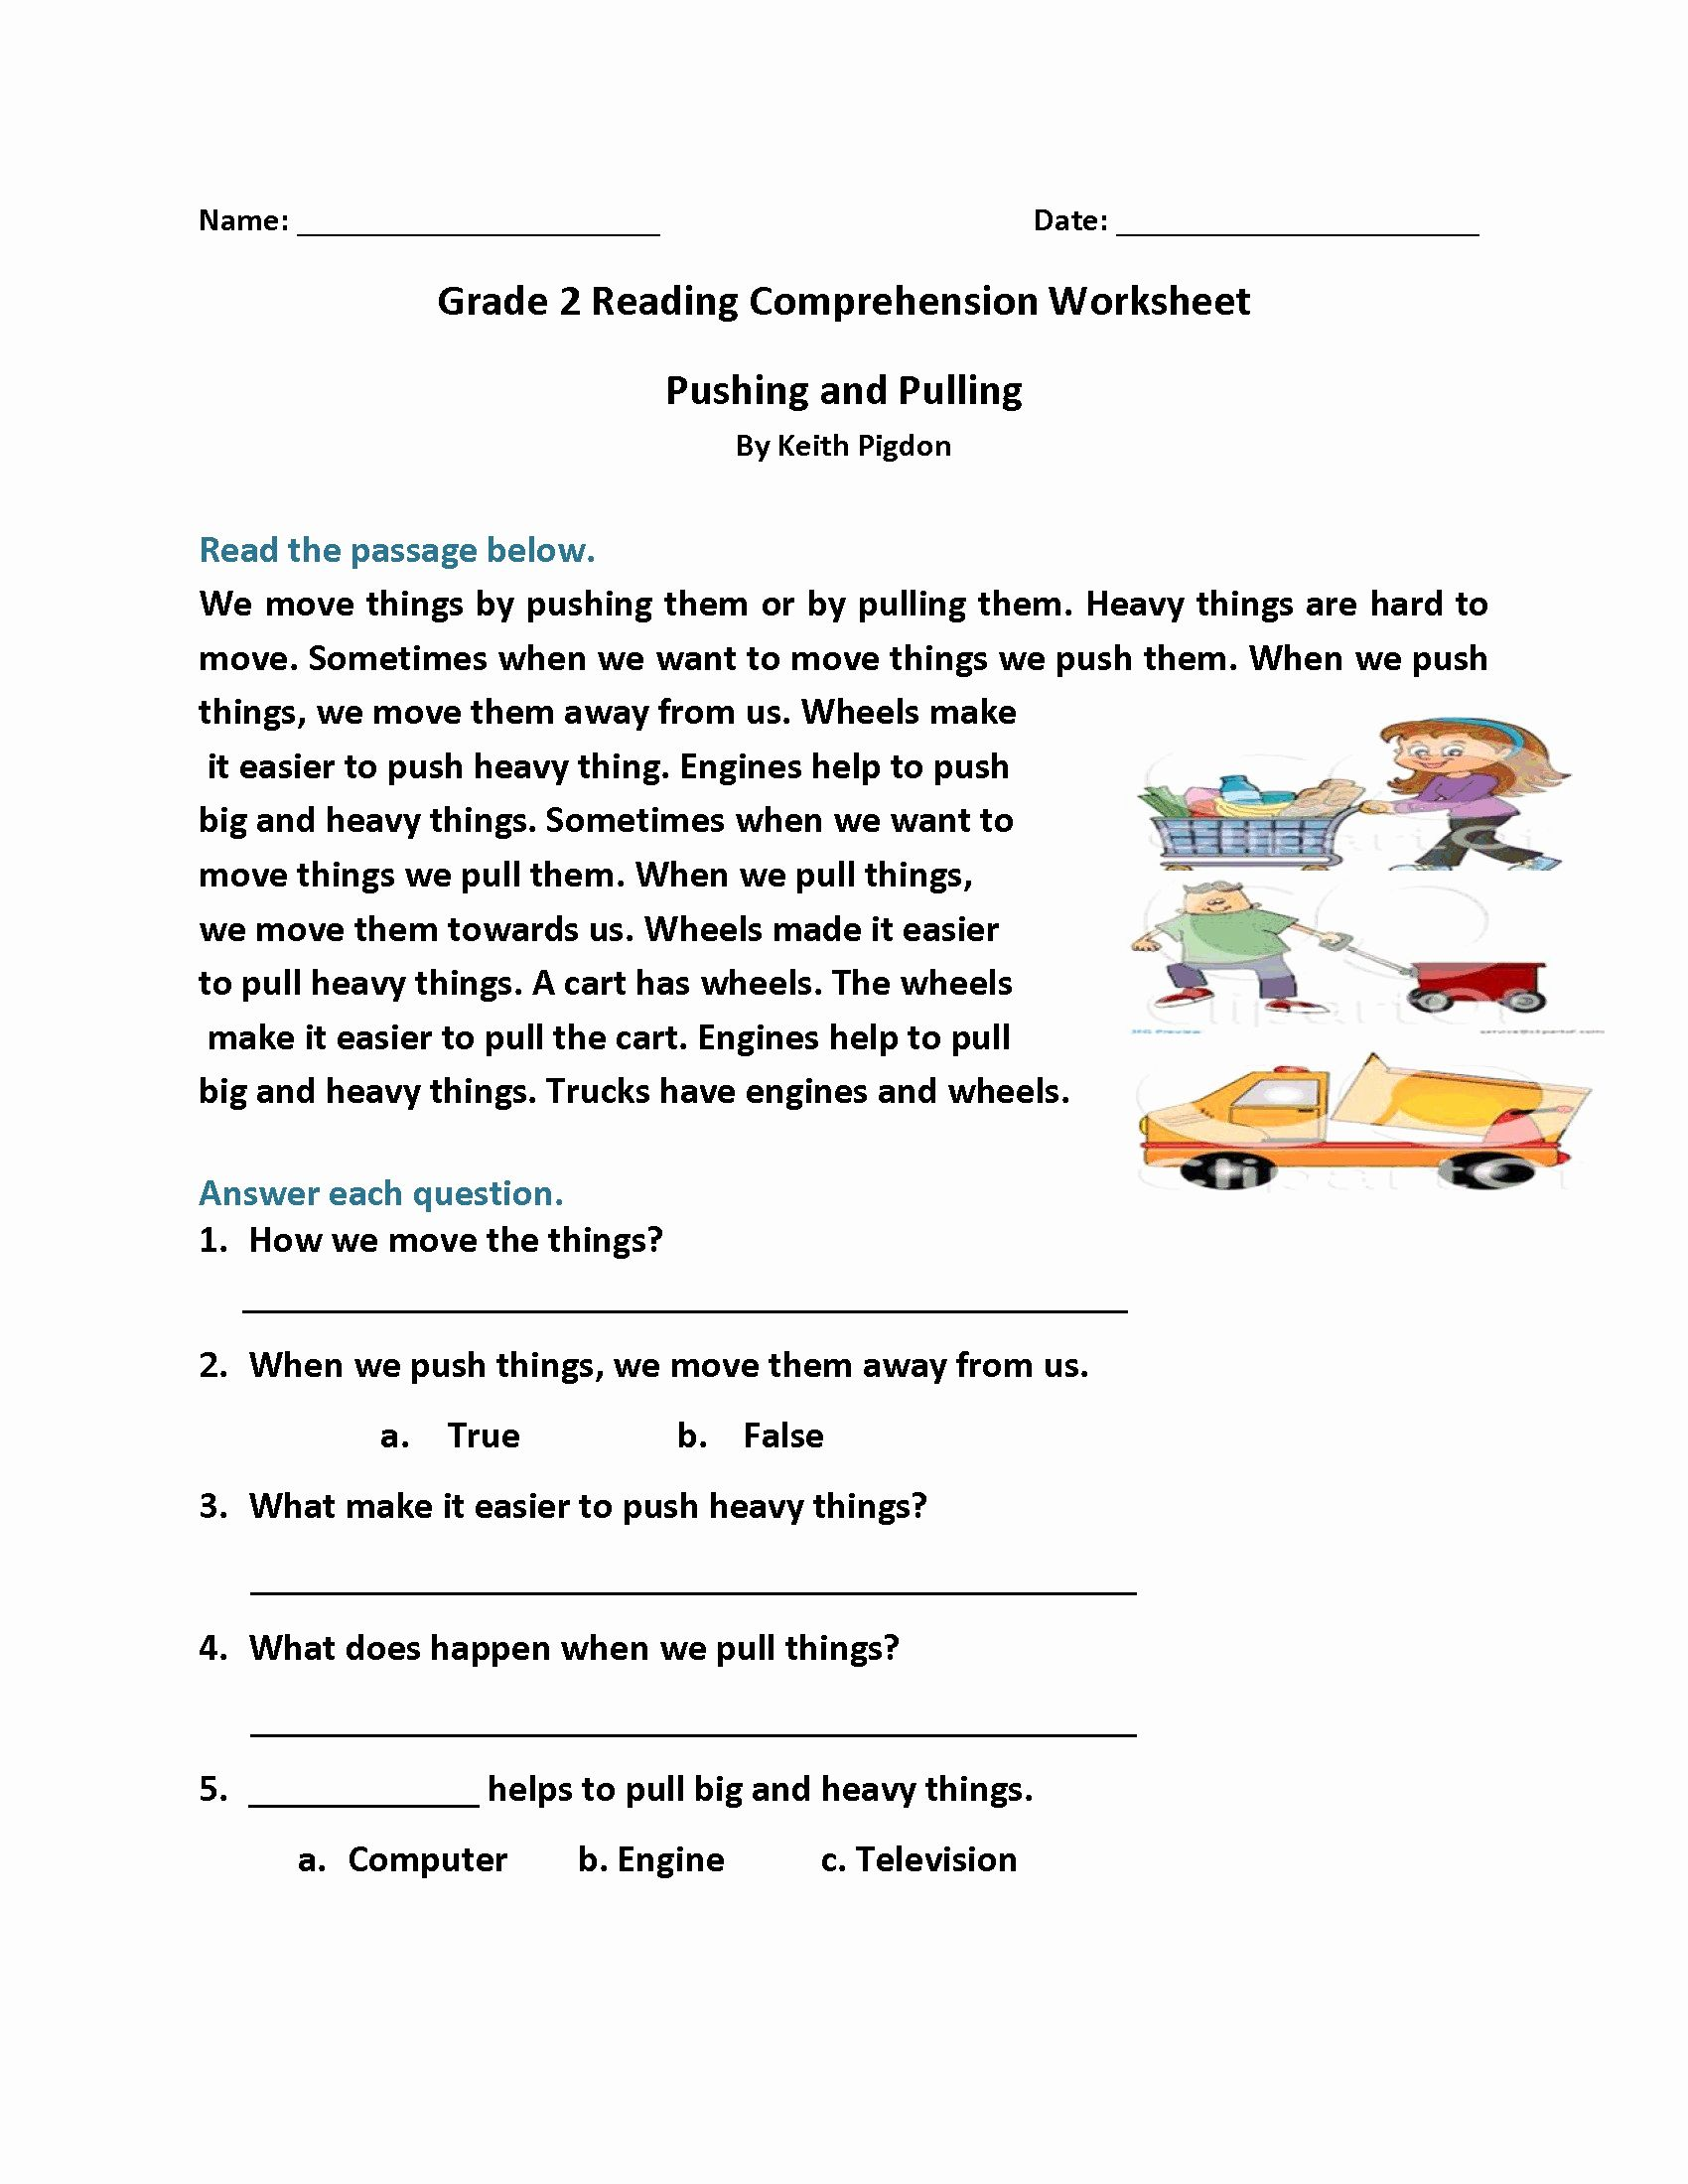 Reading Worksheets 2 In 2020 Reading Comprehension Worksheets Comprehension Worksheets 2nd Grade Reading Worksheets